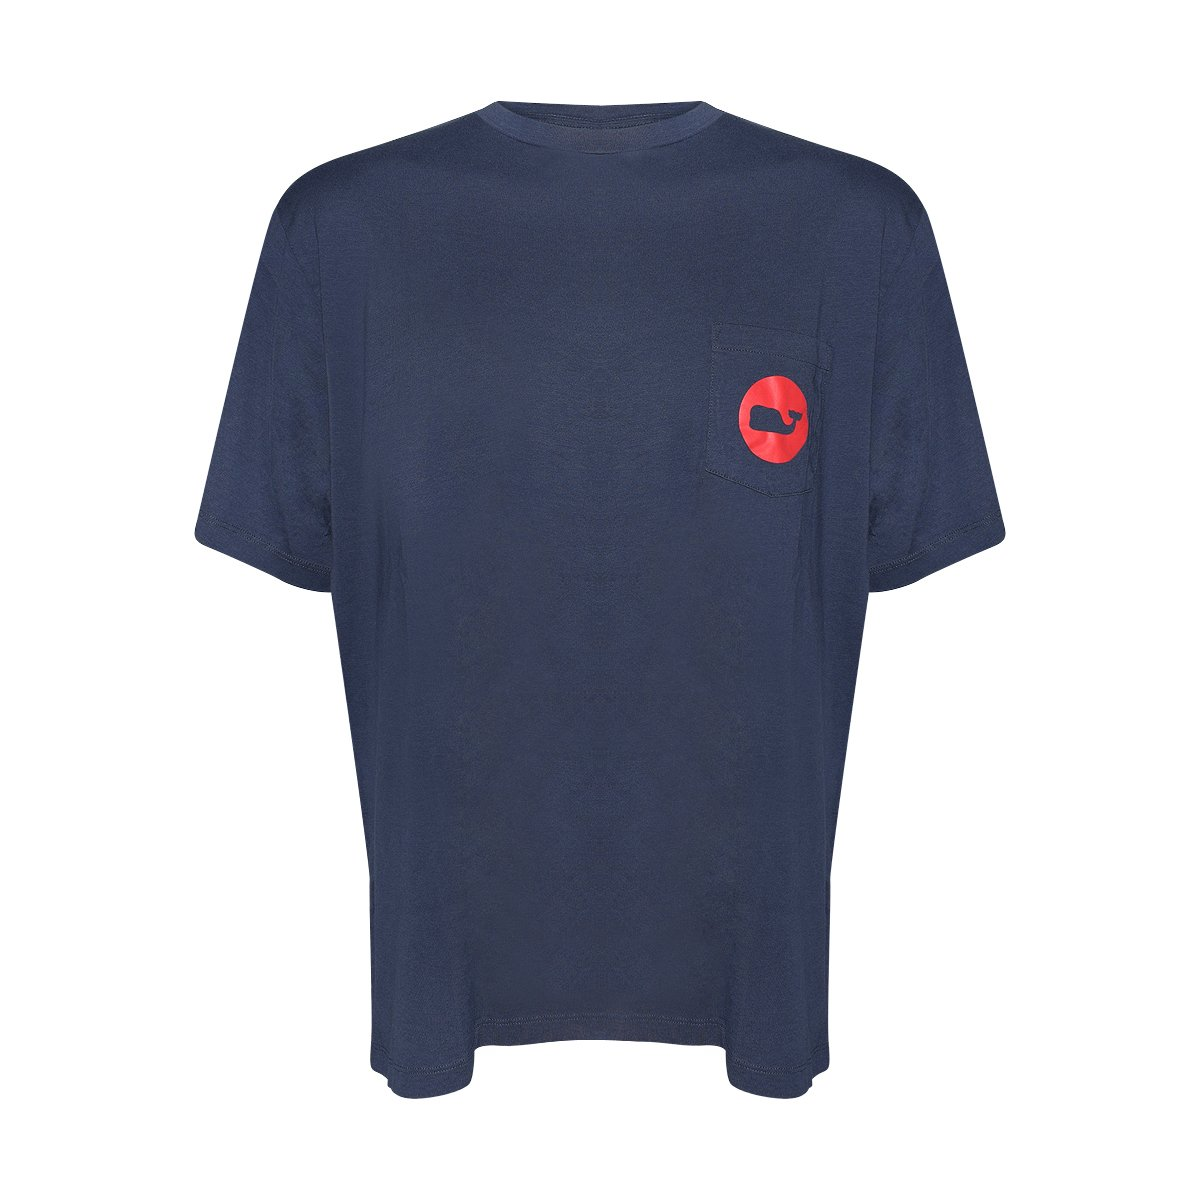 Vineyard Vinesメンズ半袖City Whale Teeシャツ B07581B5D8 X-Large|Vineyard Navy/Edsftg Vineyard Navy/Edsftg X-Large